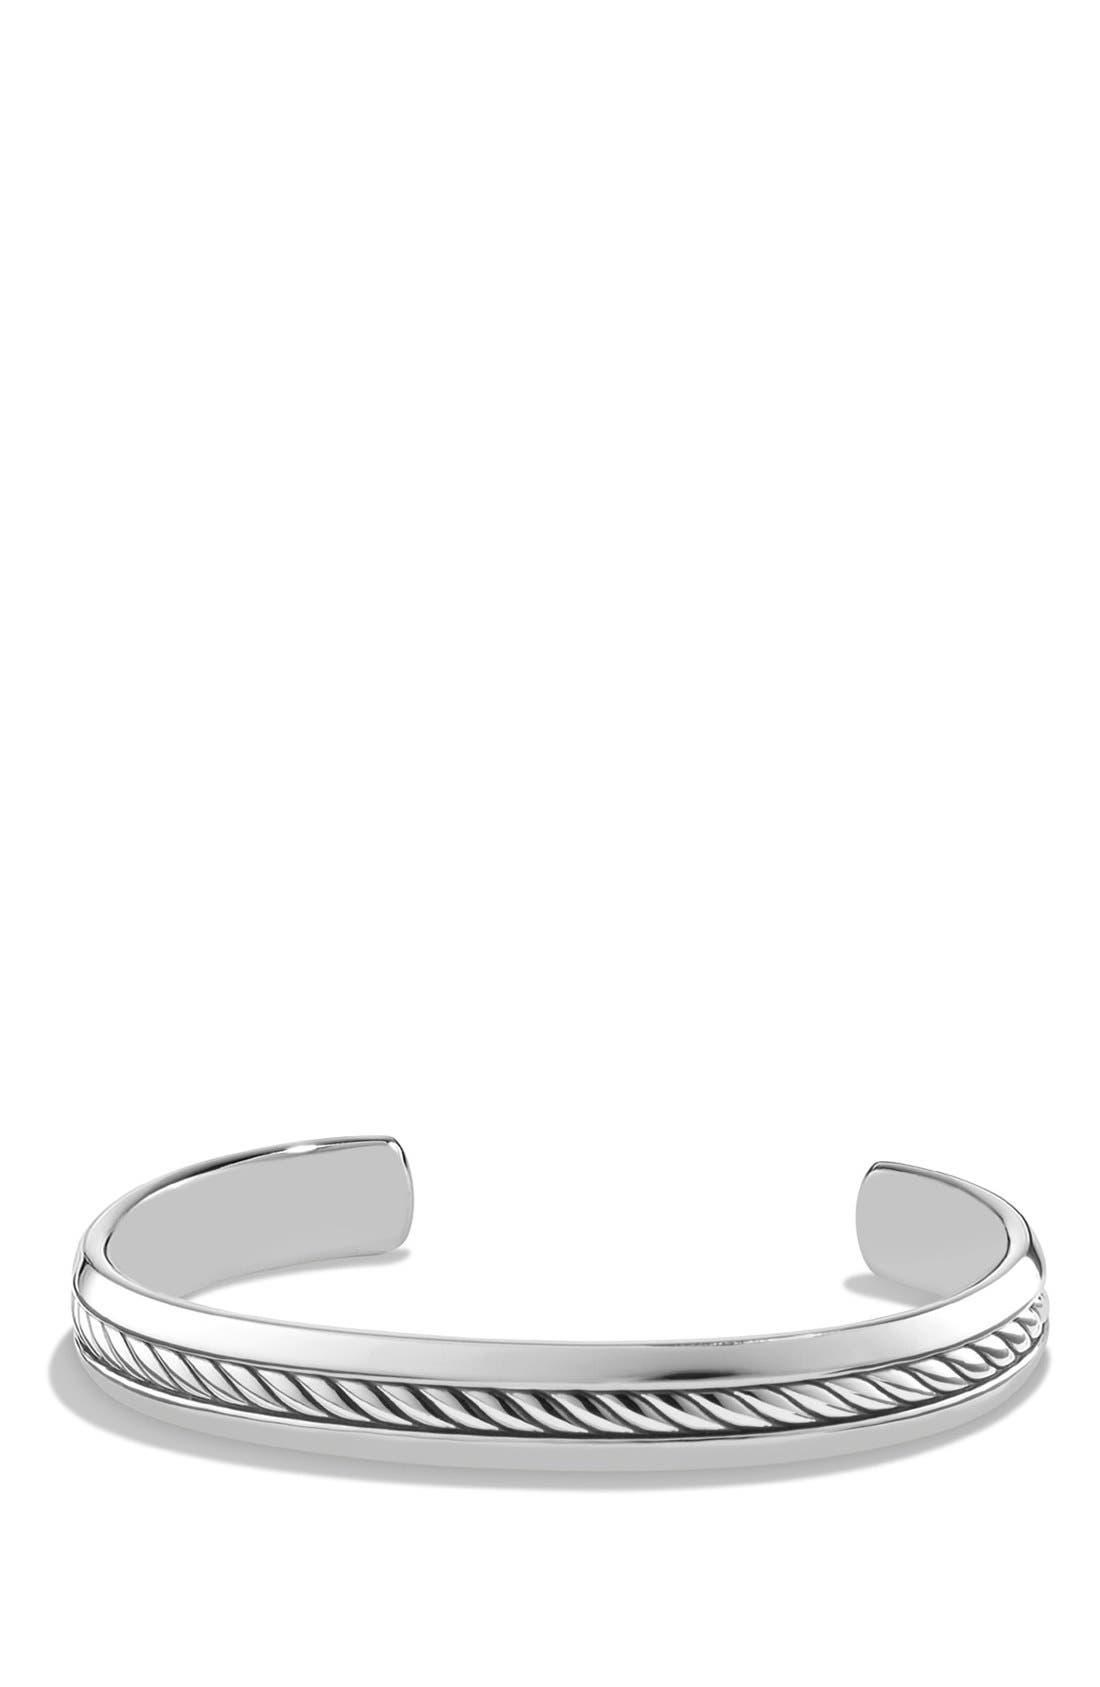 DAVID YURMAN, 'Cable Classics' Chain Bracelet, Main thumbnail 1, color, 040